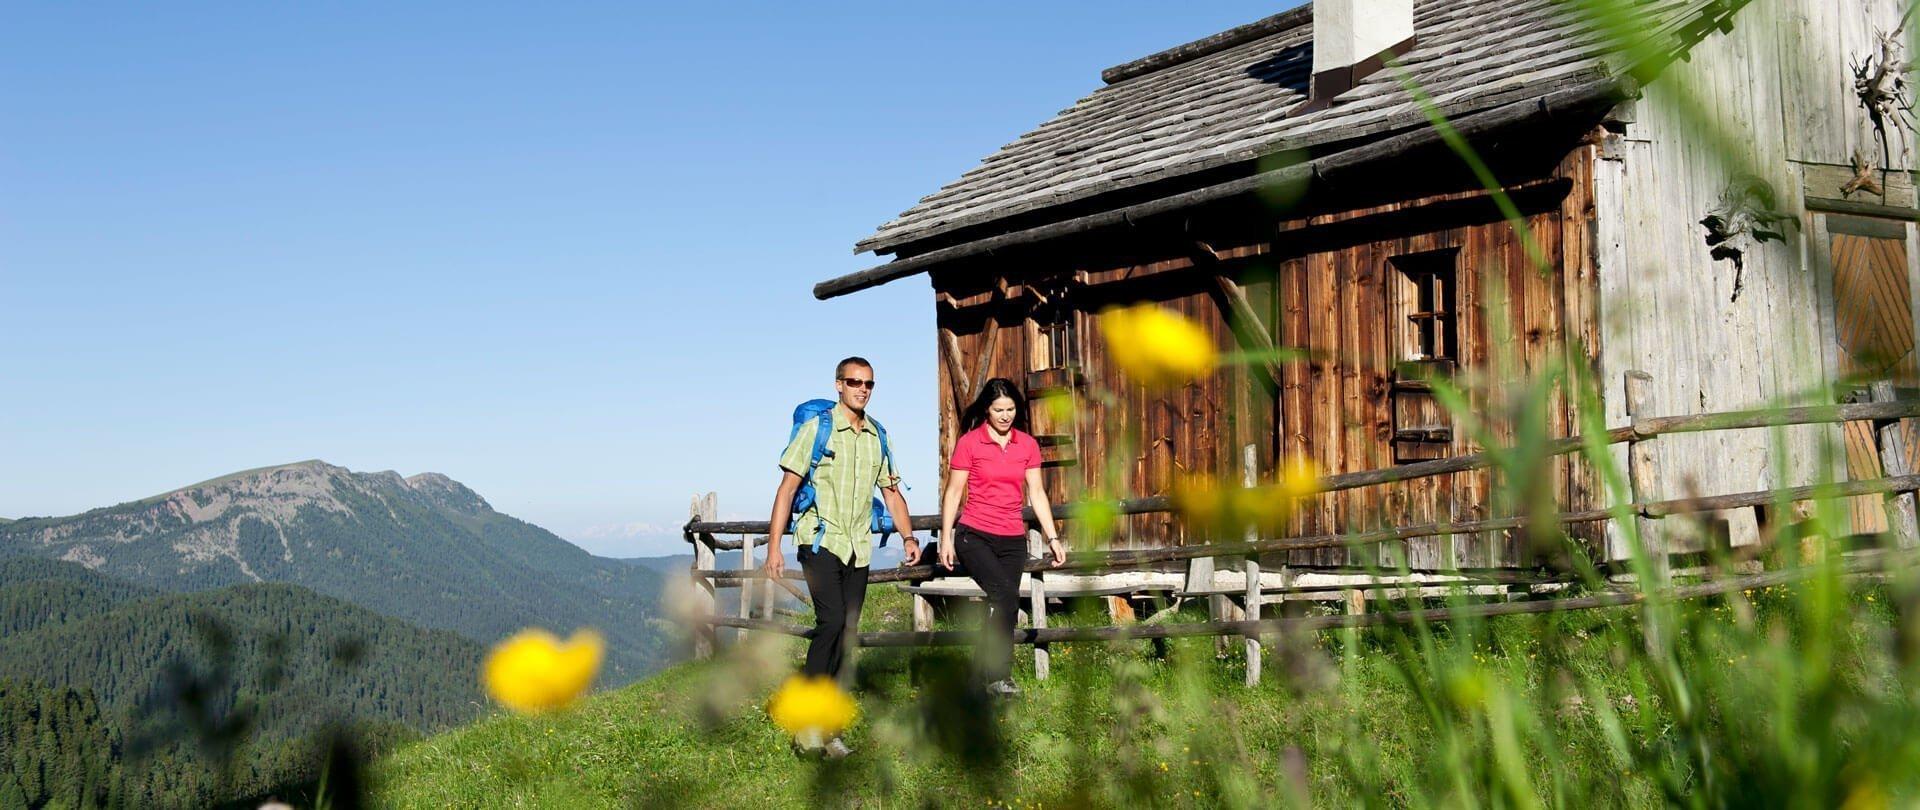 Aktivurlaub in Villnöss - Dolomiten / Südtirol